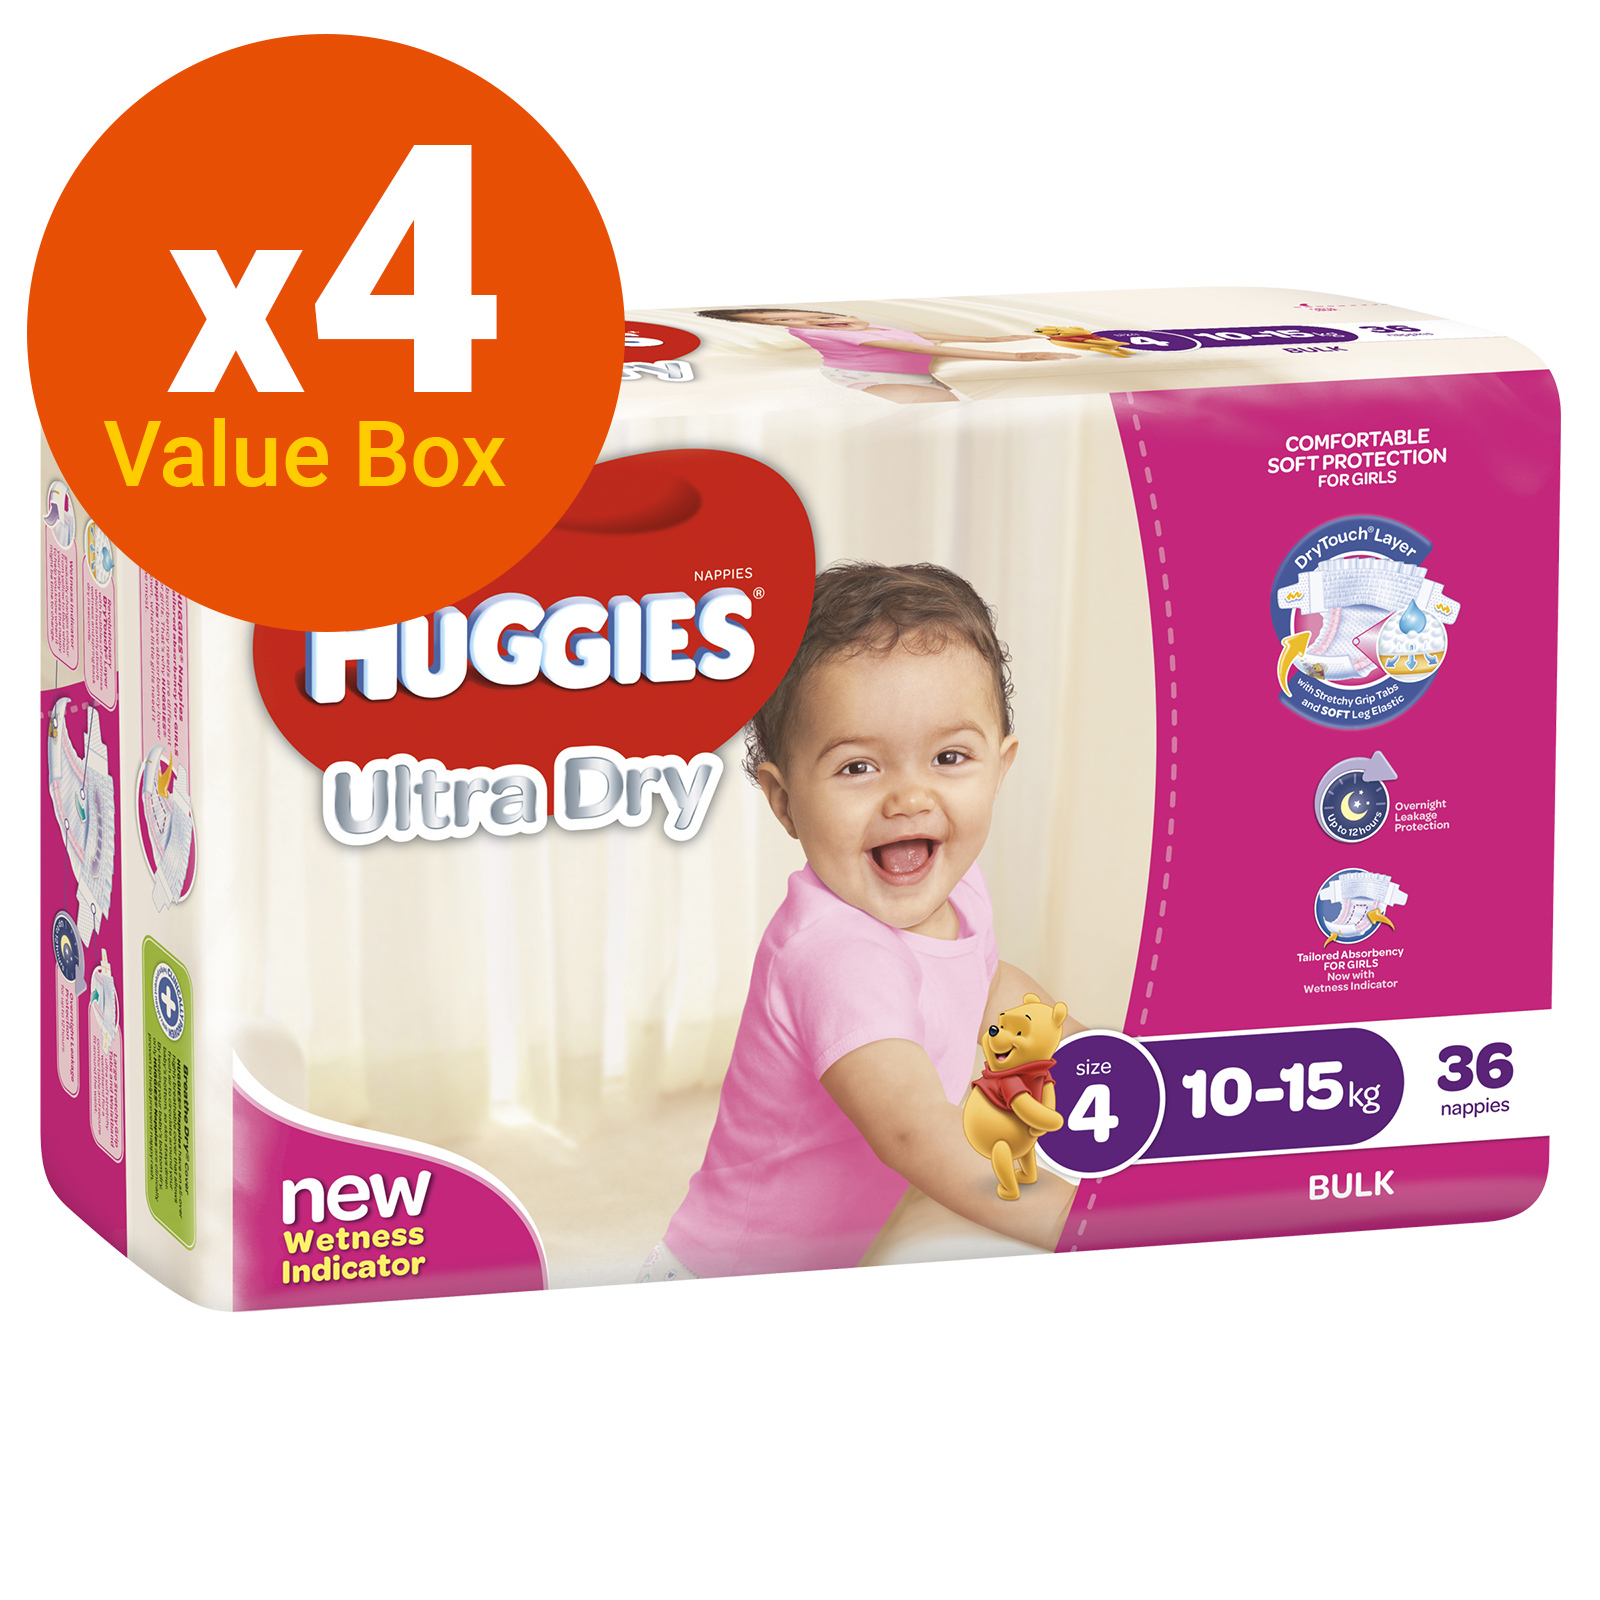 Huggies Ultra Dry Nappies Bulk Value Box - Size 4 Toddler Girl (144) image